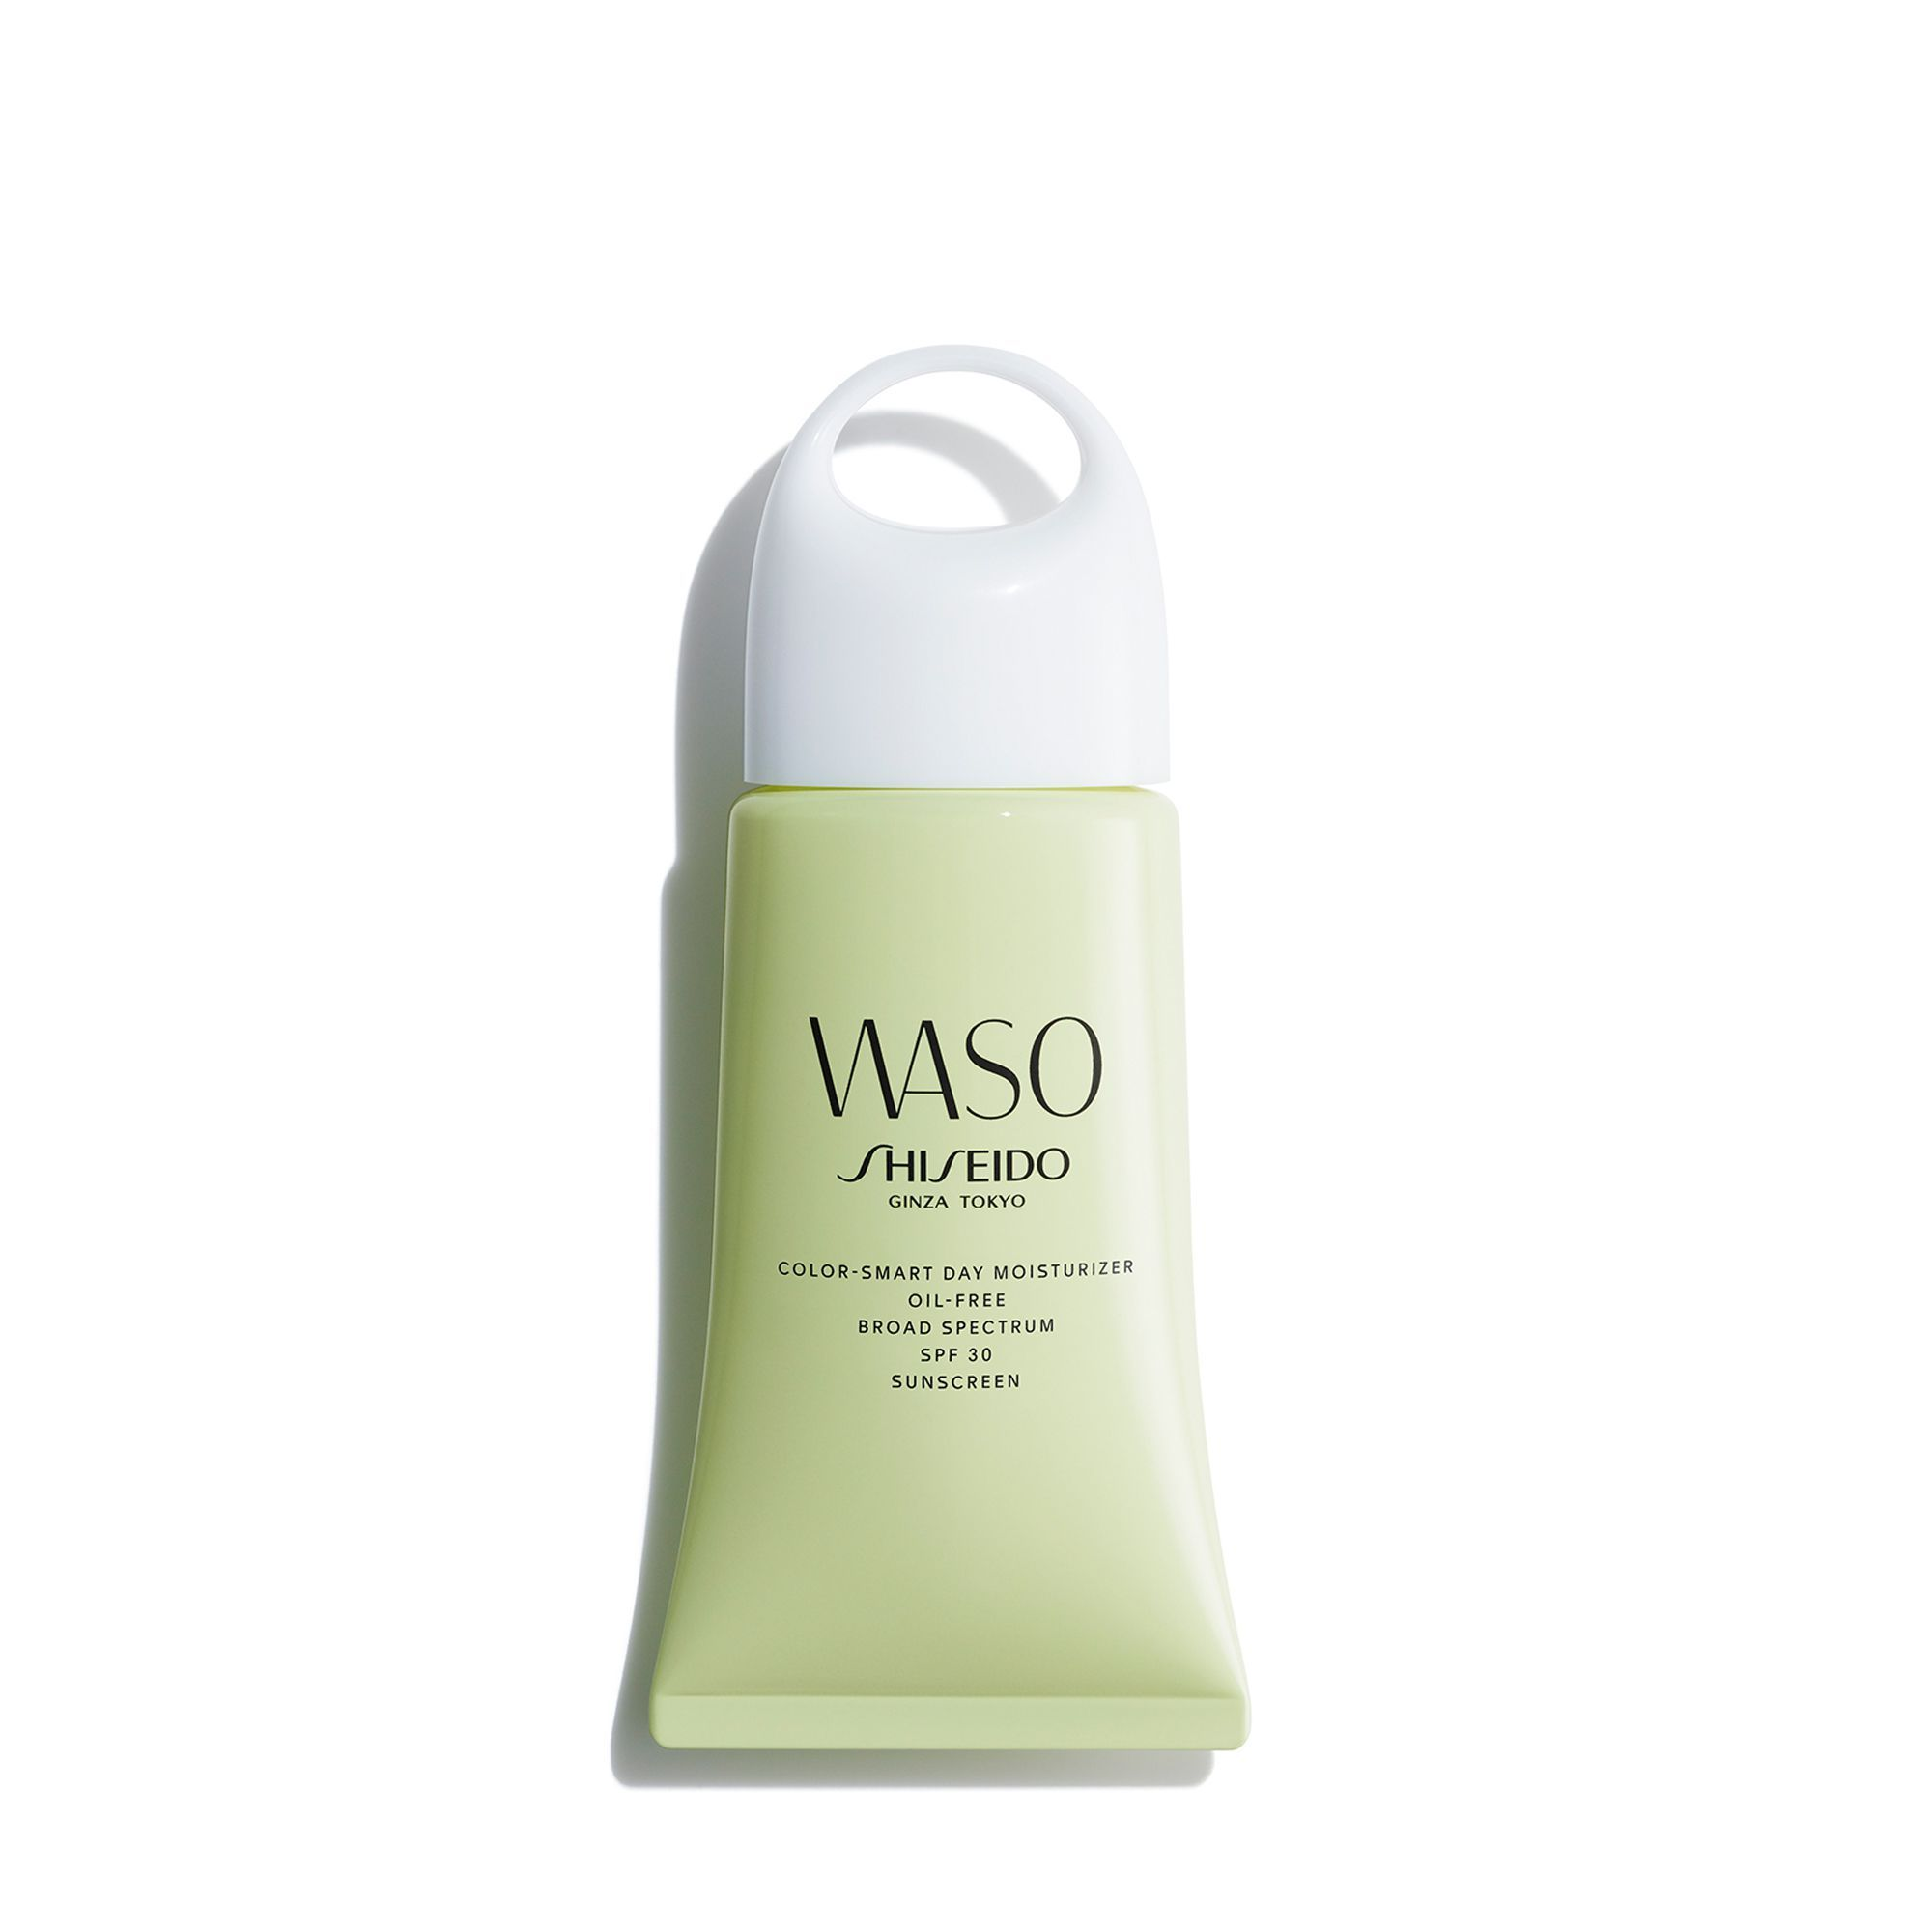 Shiseido Waso Color-Smart Day Moisturizer Oil-Free SPF 30